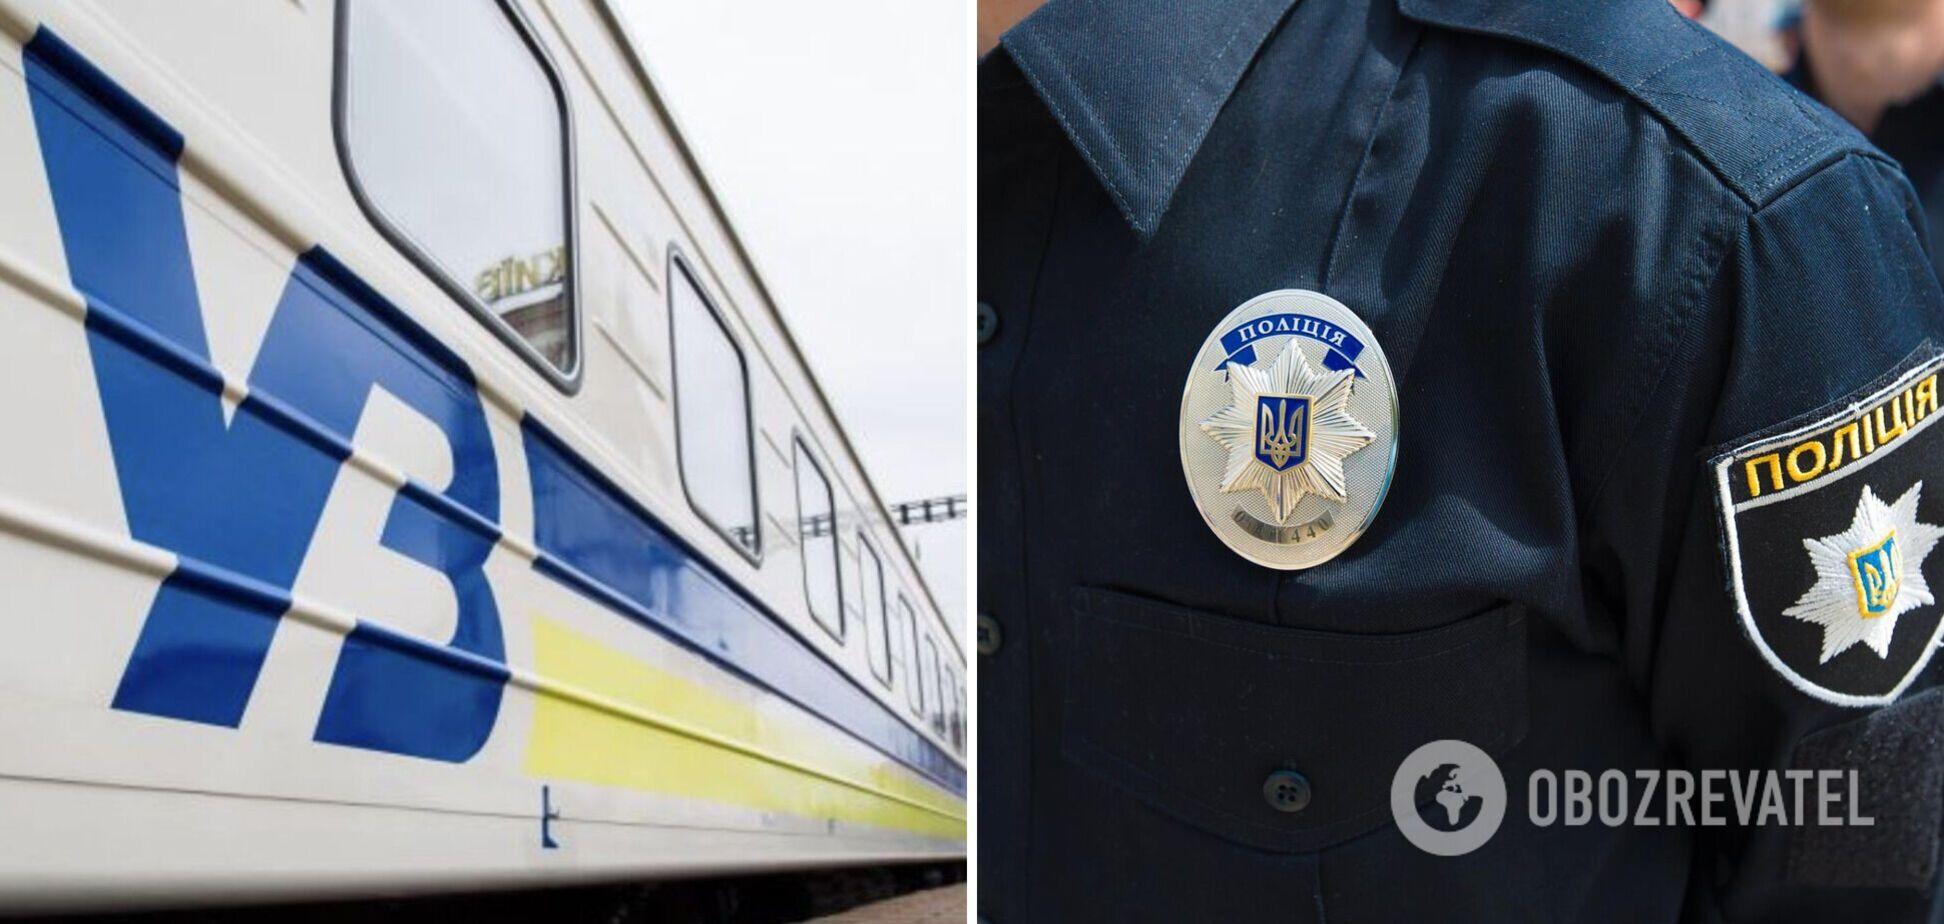 Пассажир 'Укрзалізниці' упал с верхней полки и на утро умер